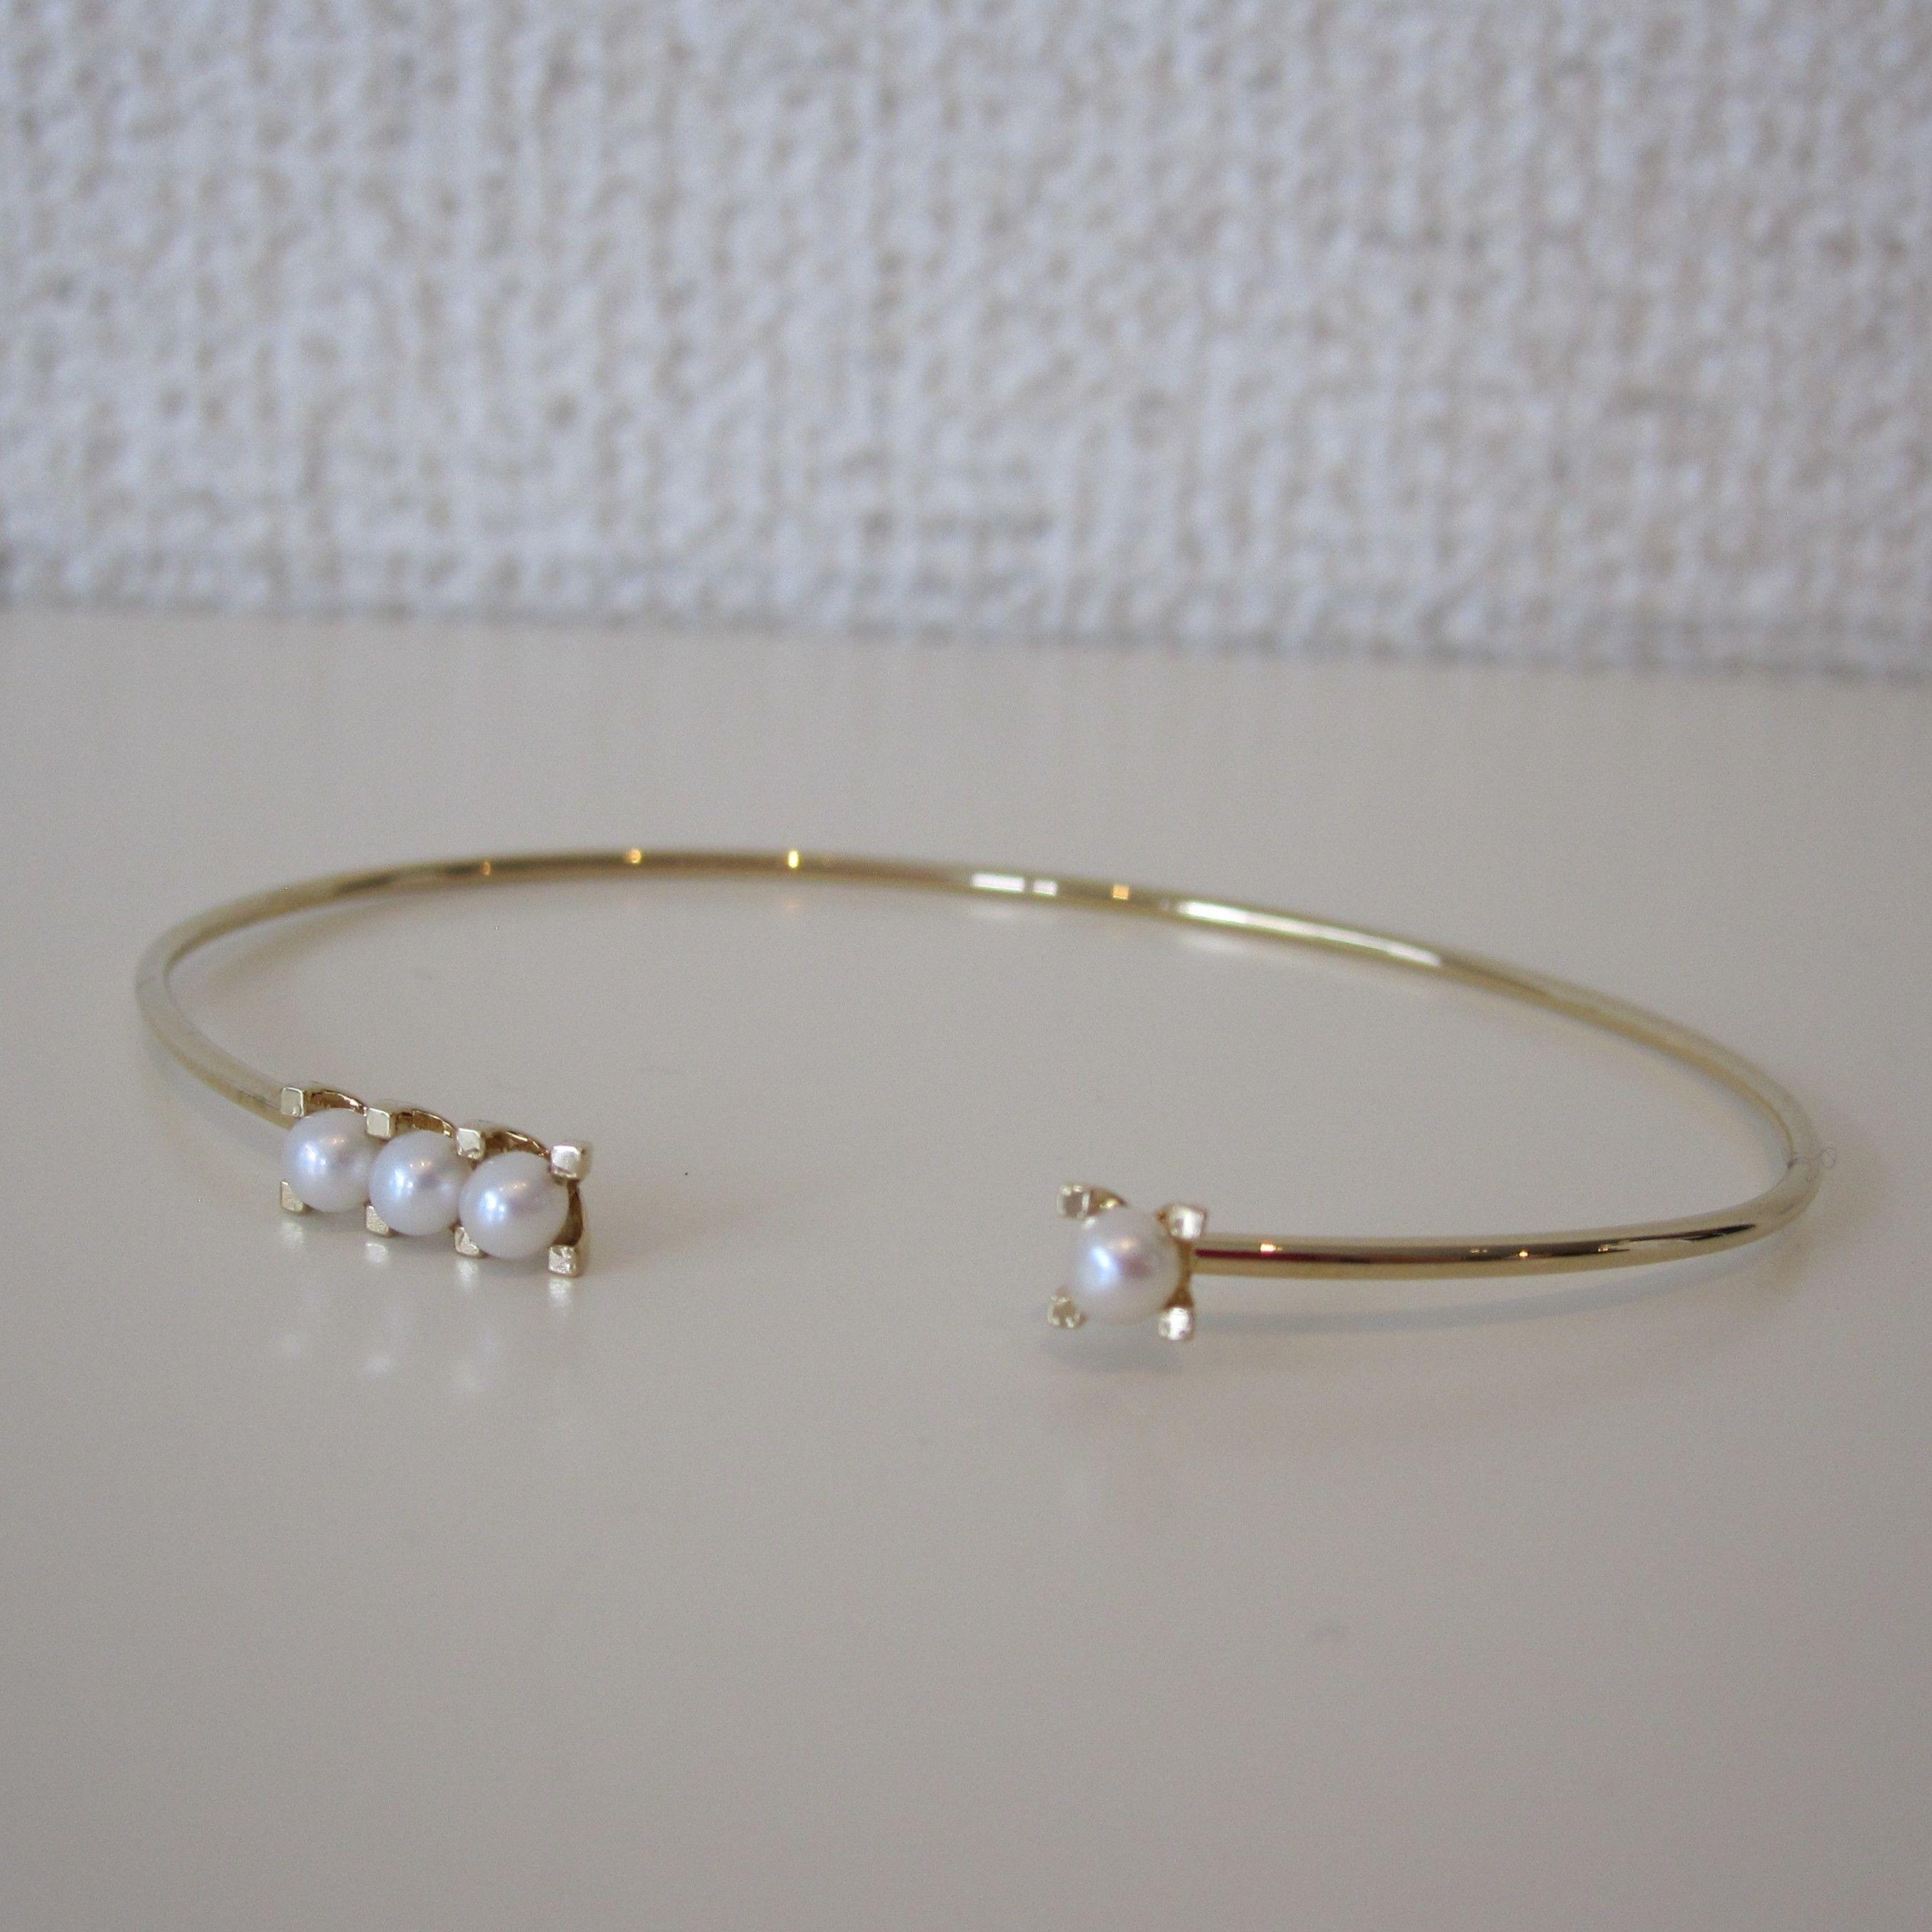 FULLOFGRACE pearl bracelet